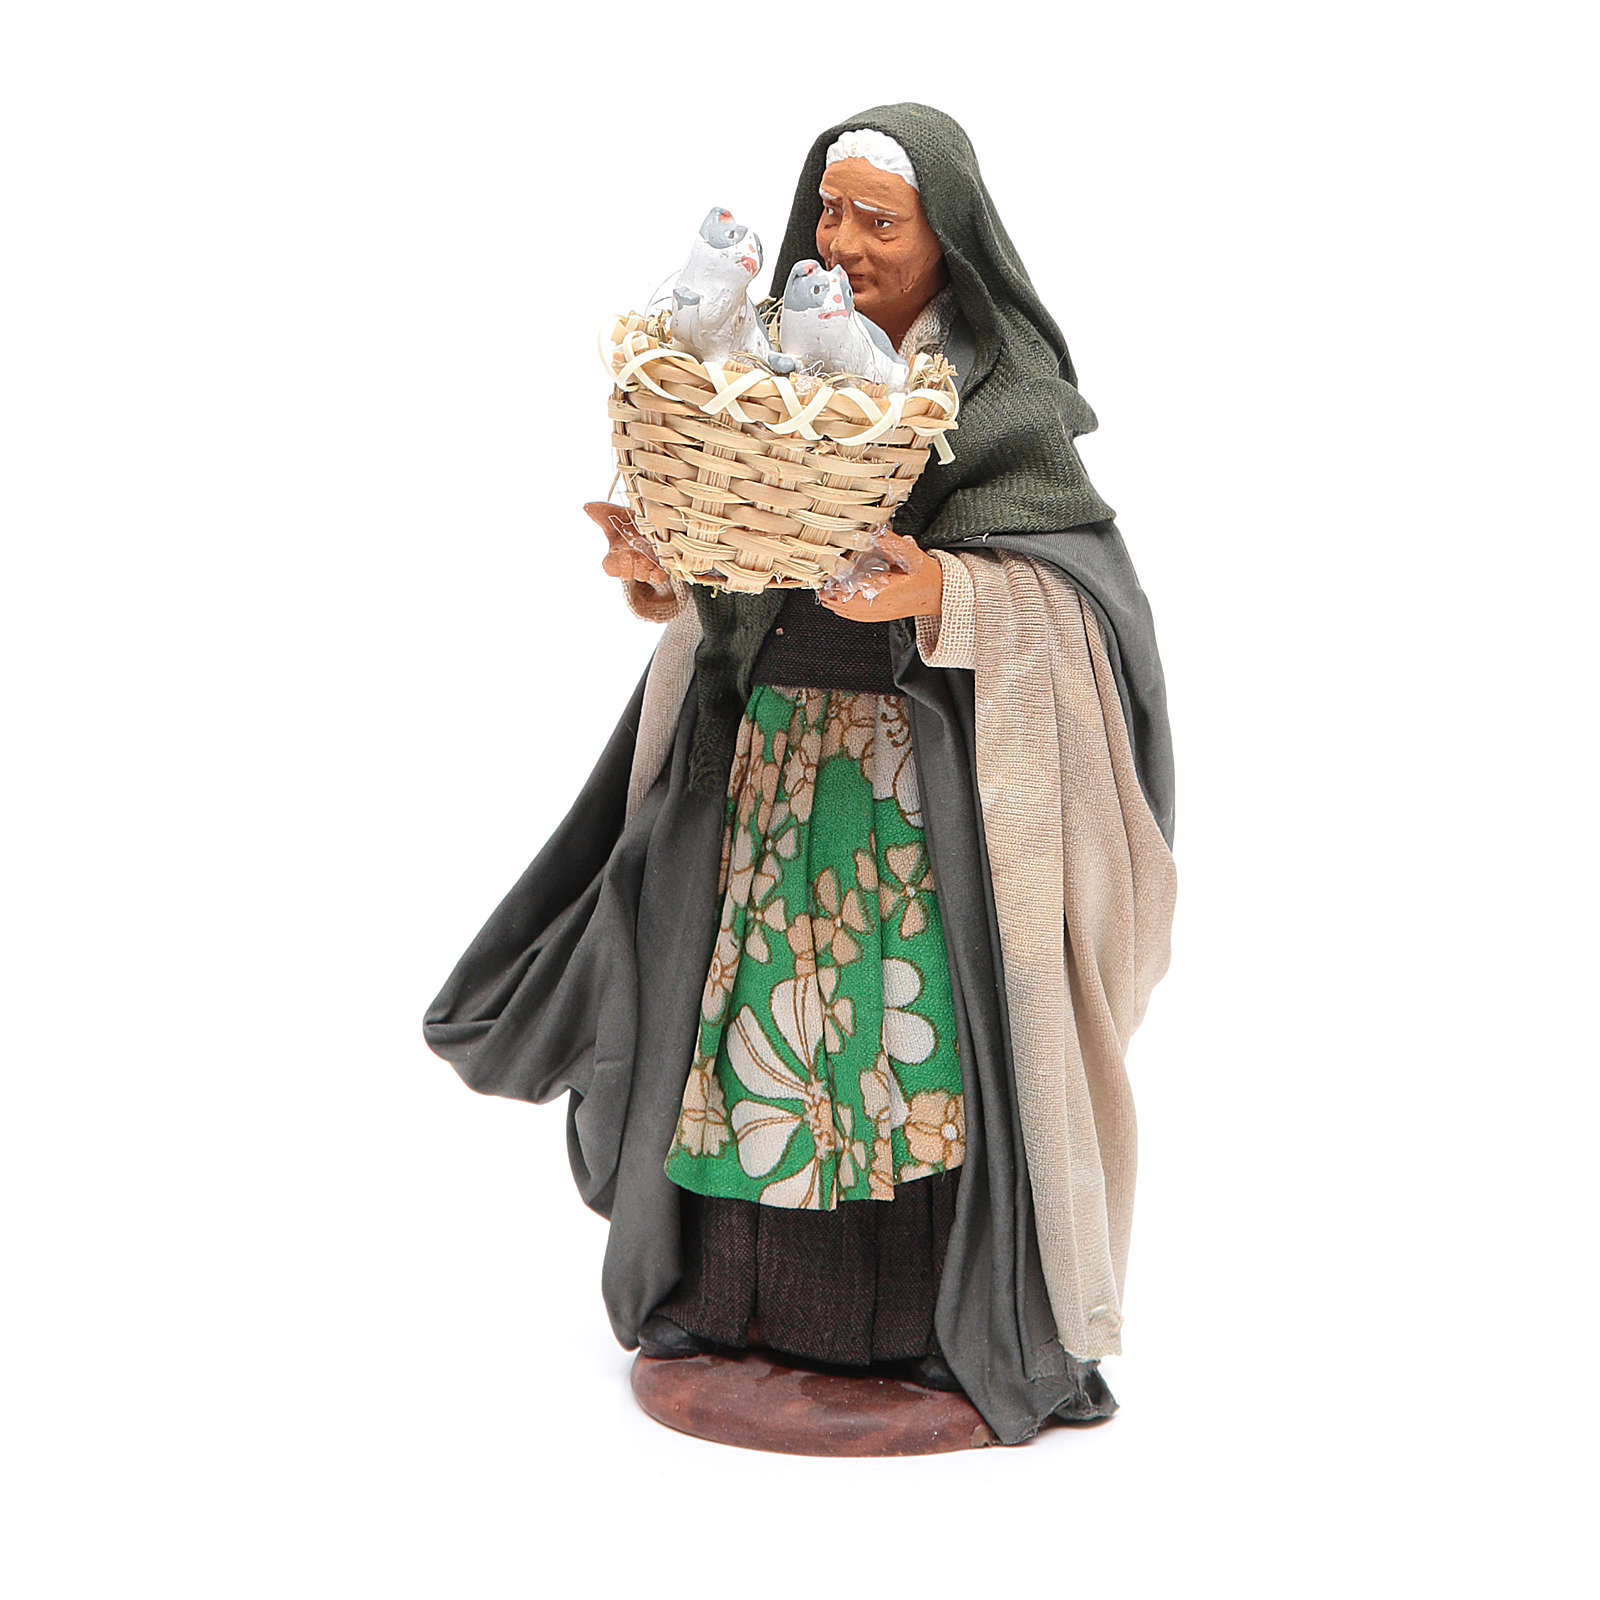 Mujer con cesto con gatos 14 cm belén napolitano 4